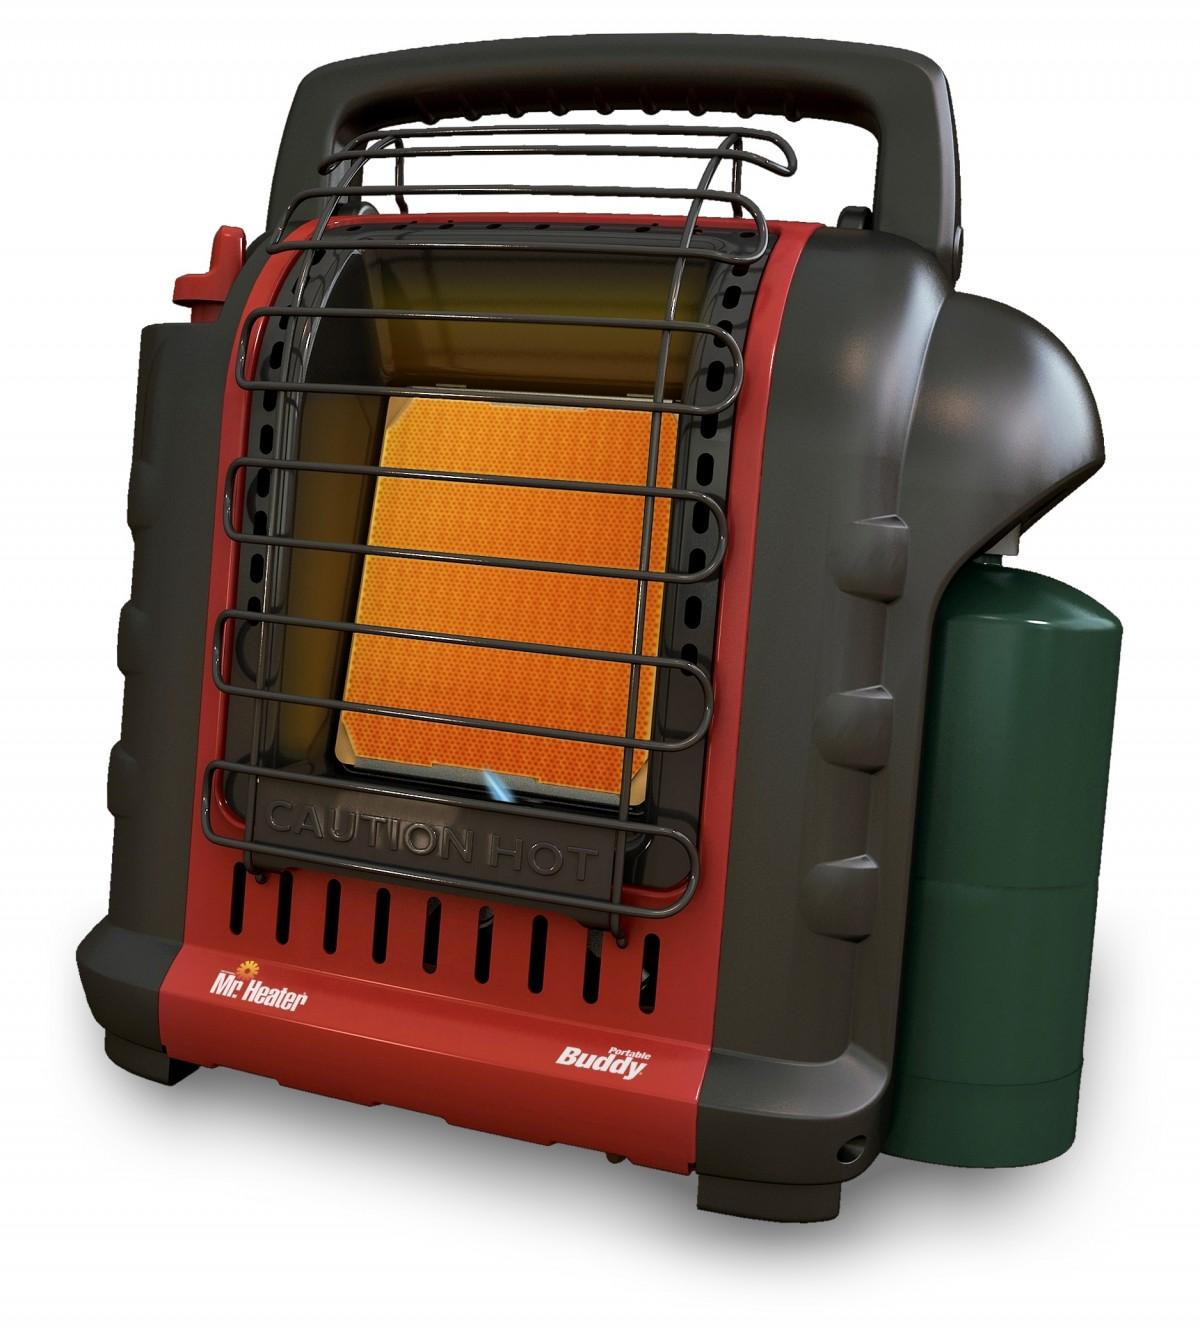 Portable Quot Buddy Quot Propane Heater Model Mh9b